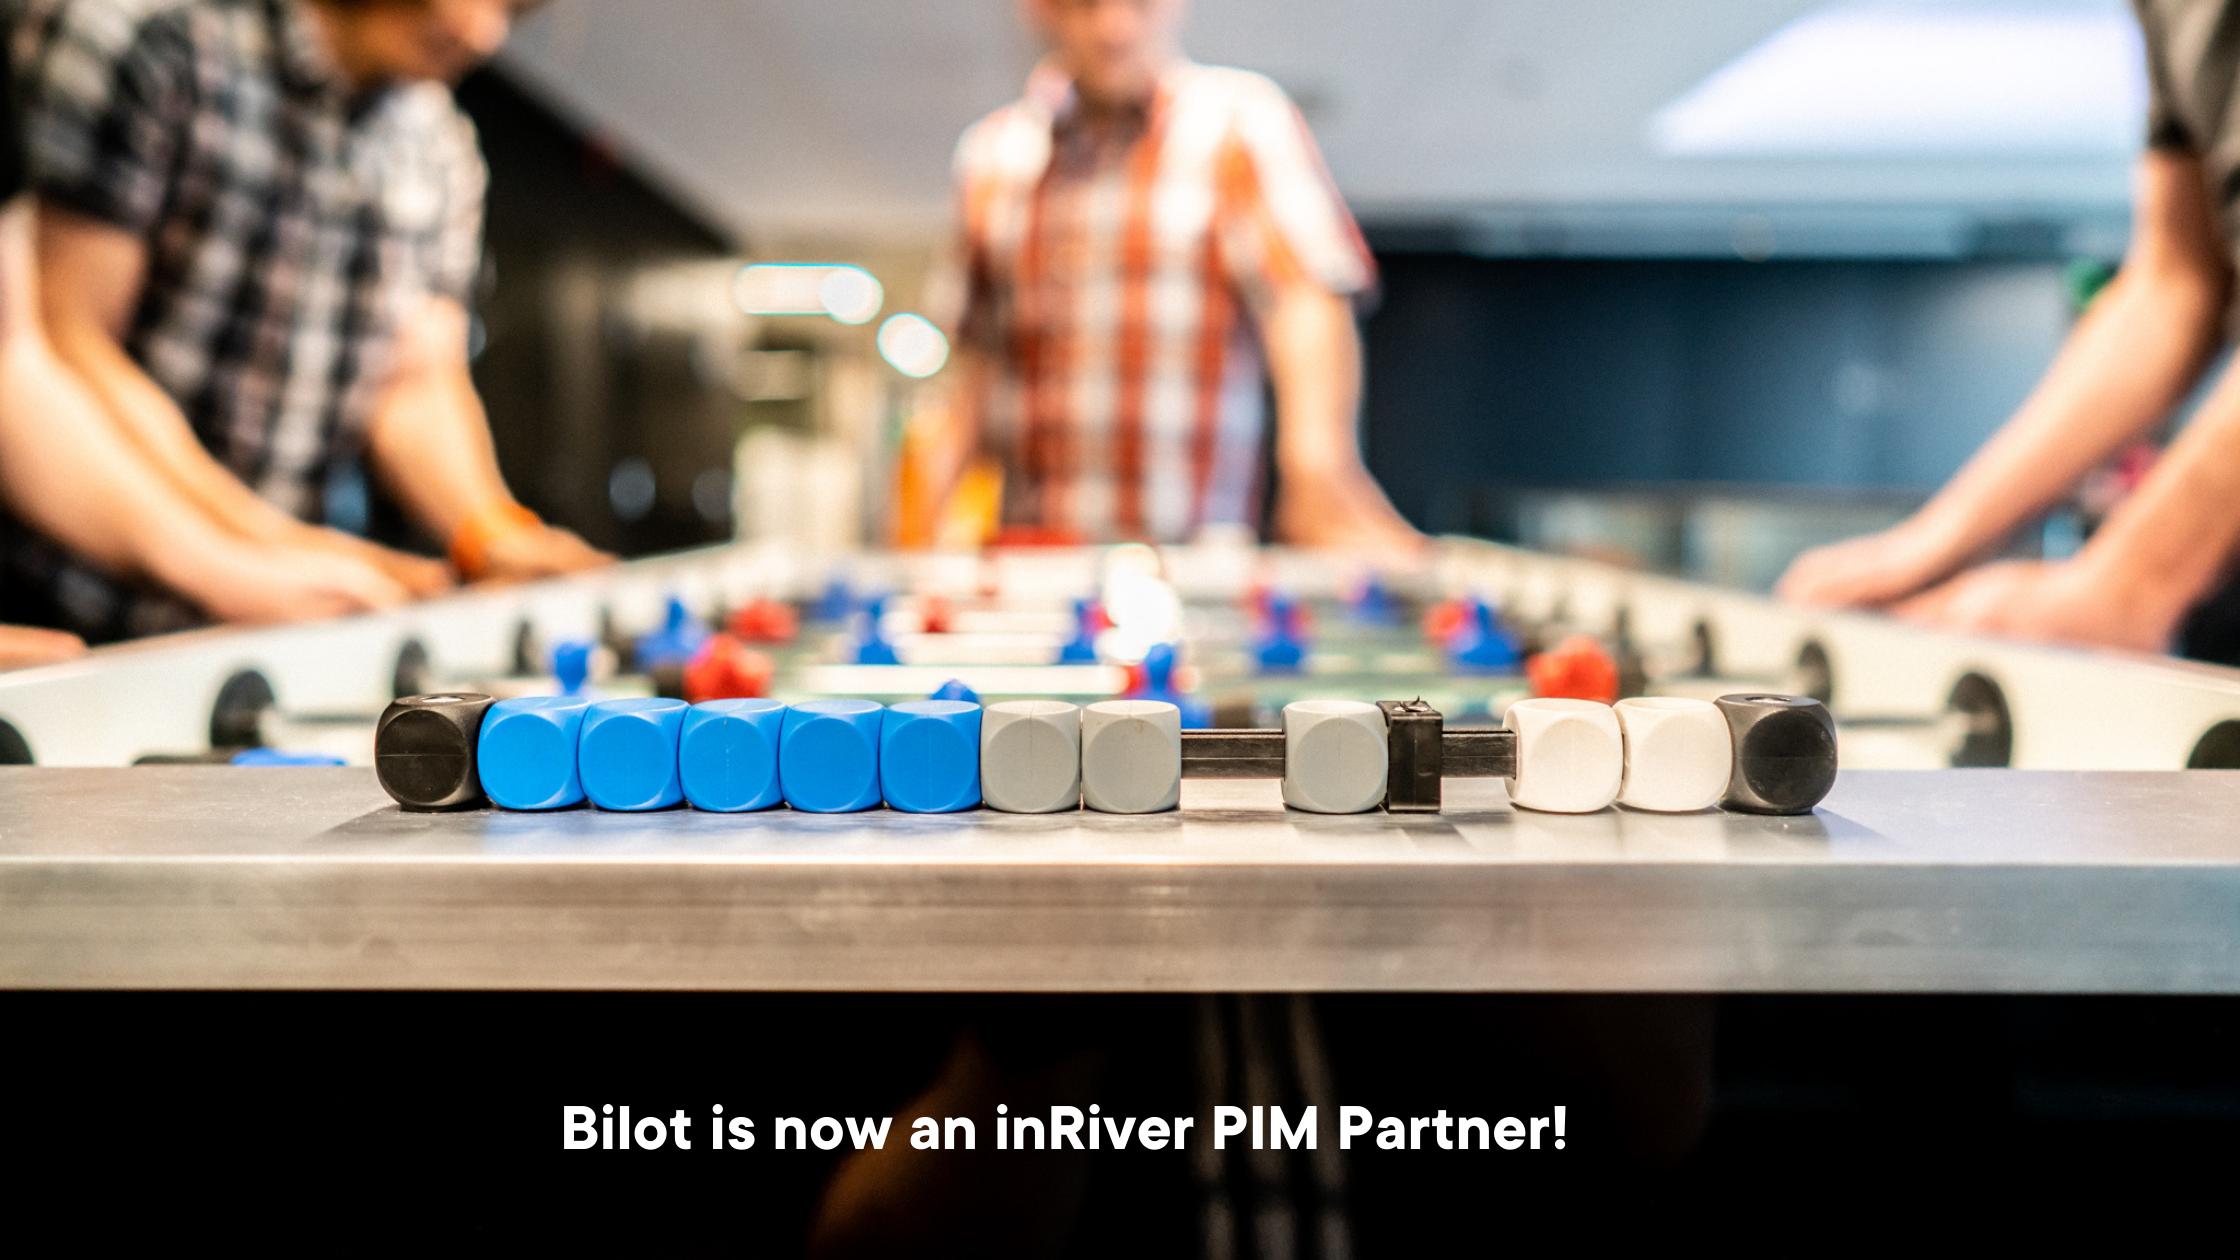 Bilot is now an inRiver PIM Partner!